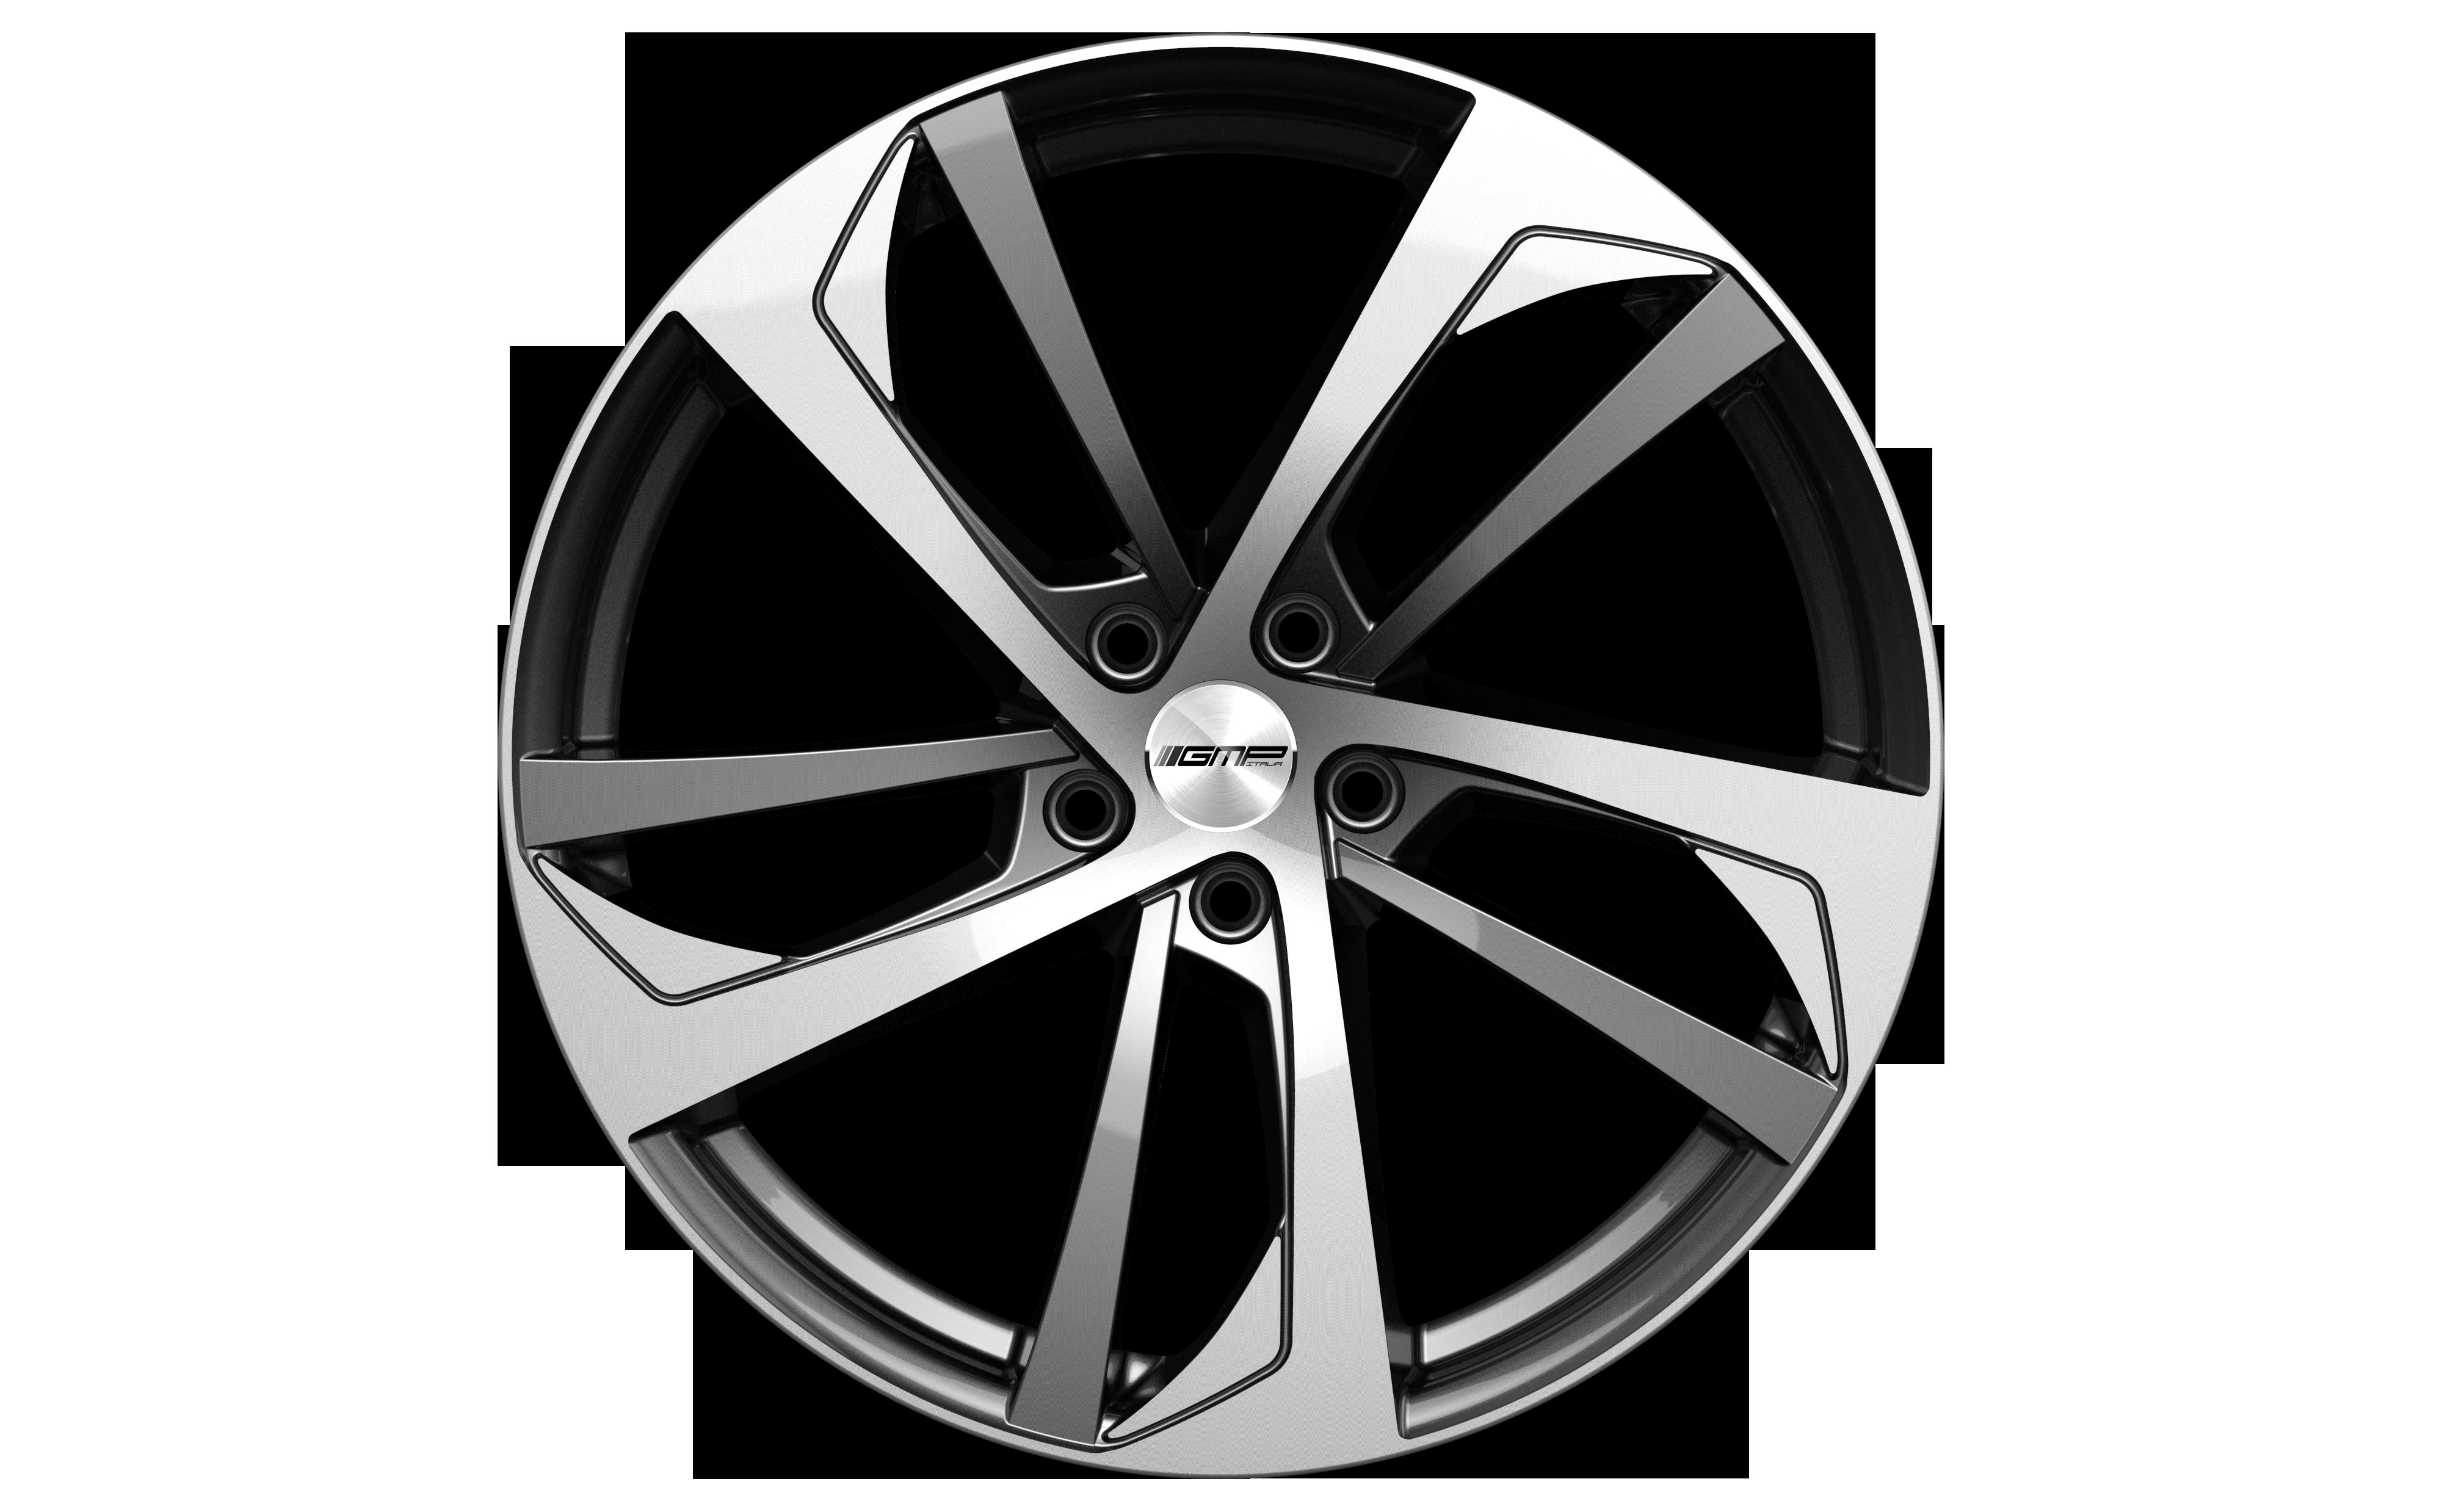 Pin On Katana Alloy Wheels